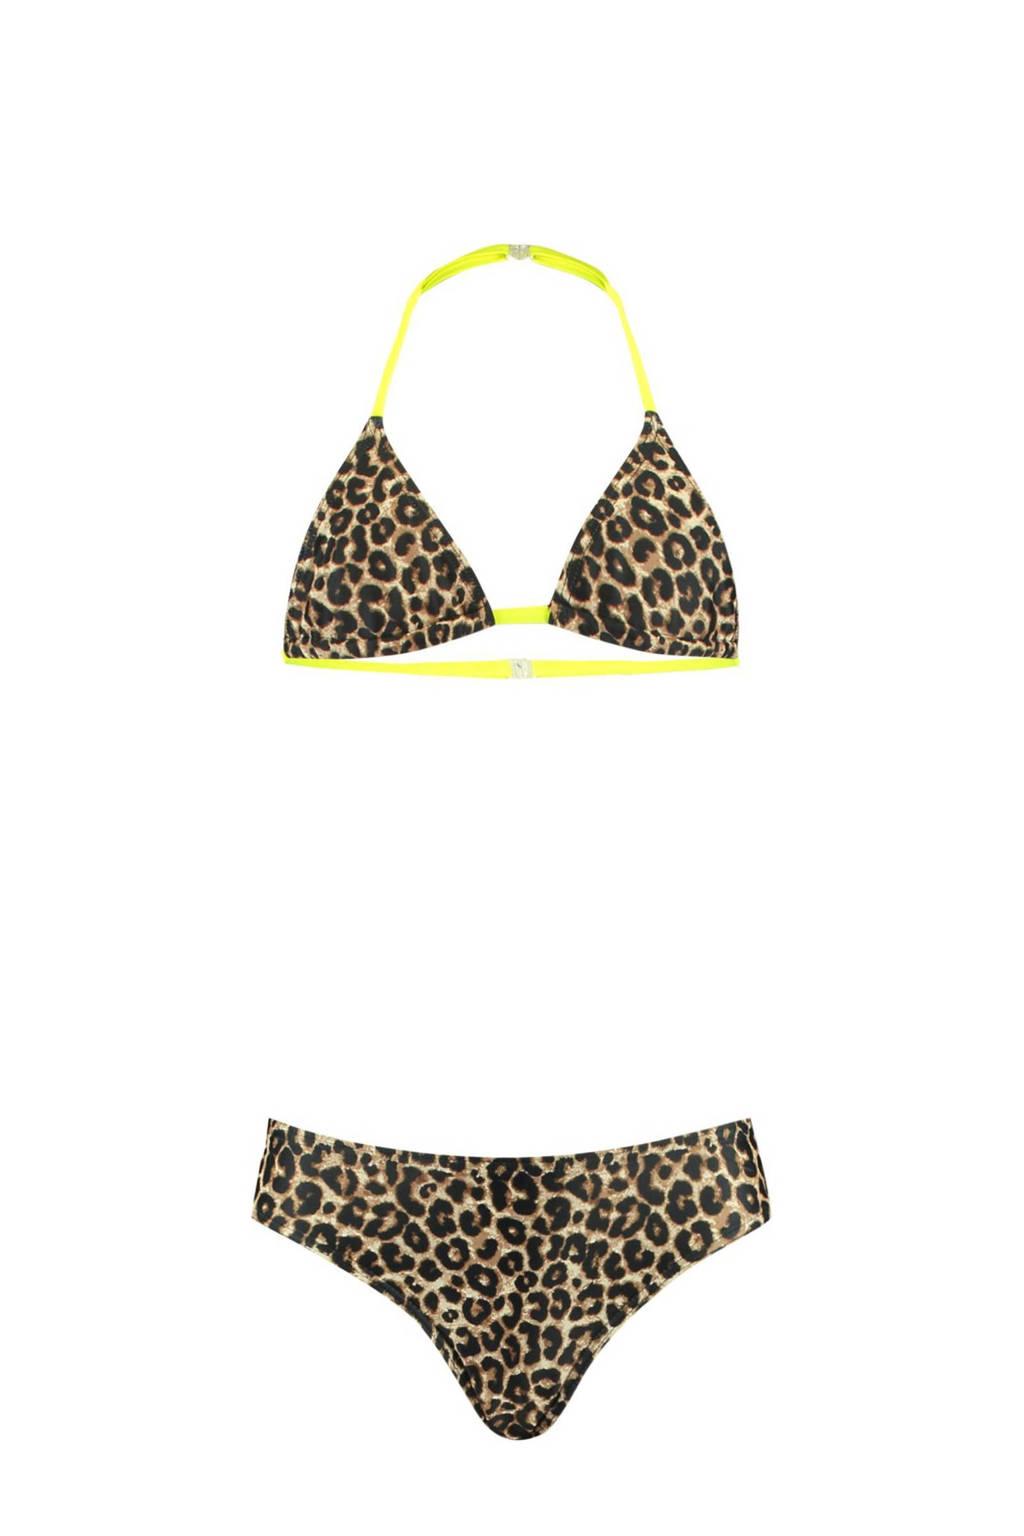 CoolCat Junior triangel bikini Yoella met panterprint bruin/zwart, Bruin/zwart